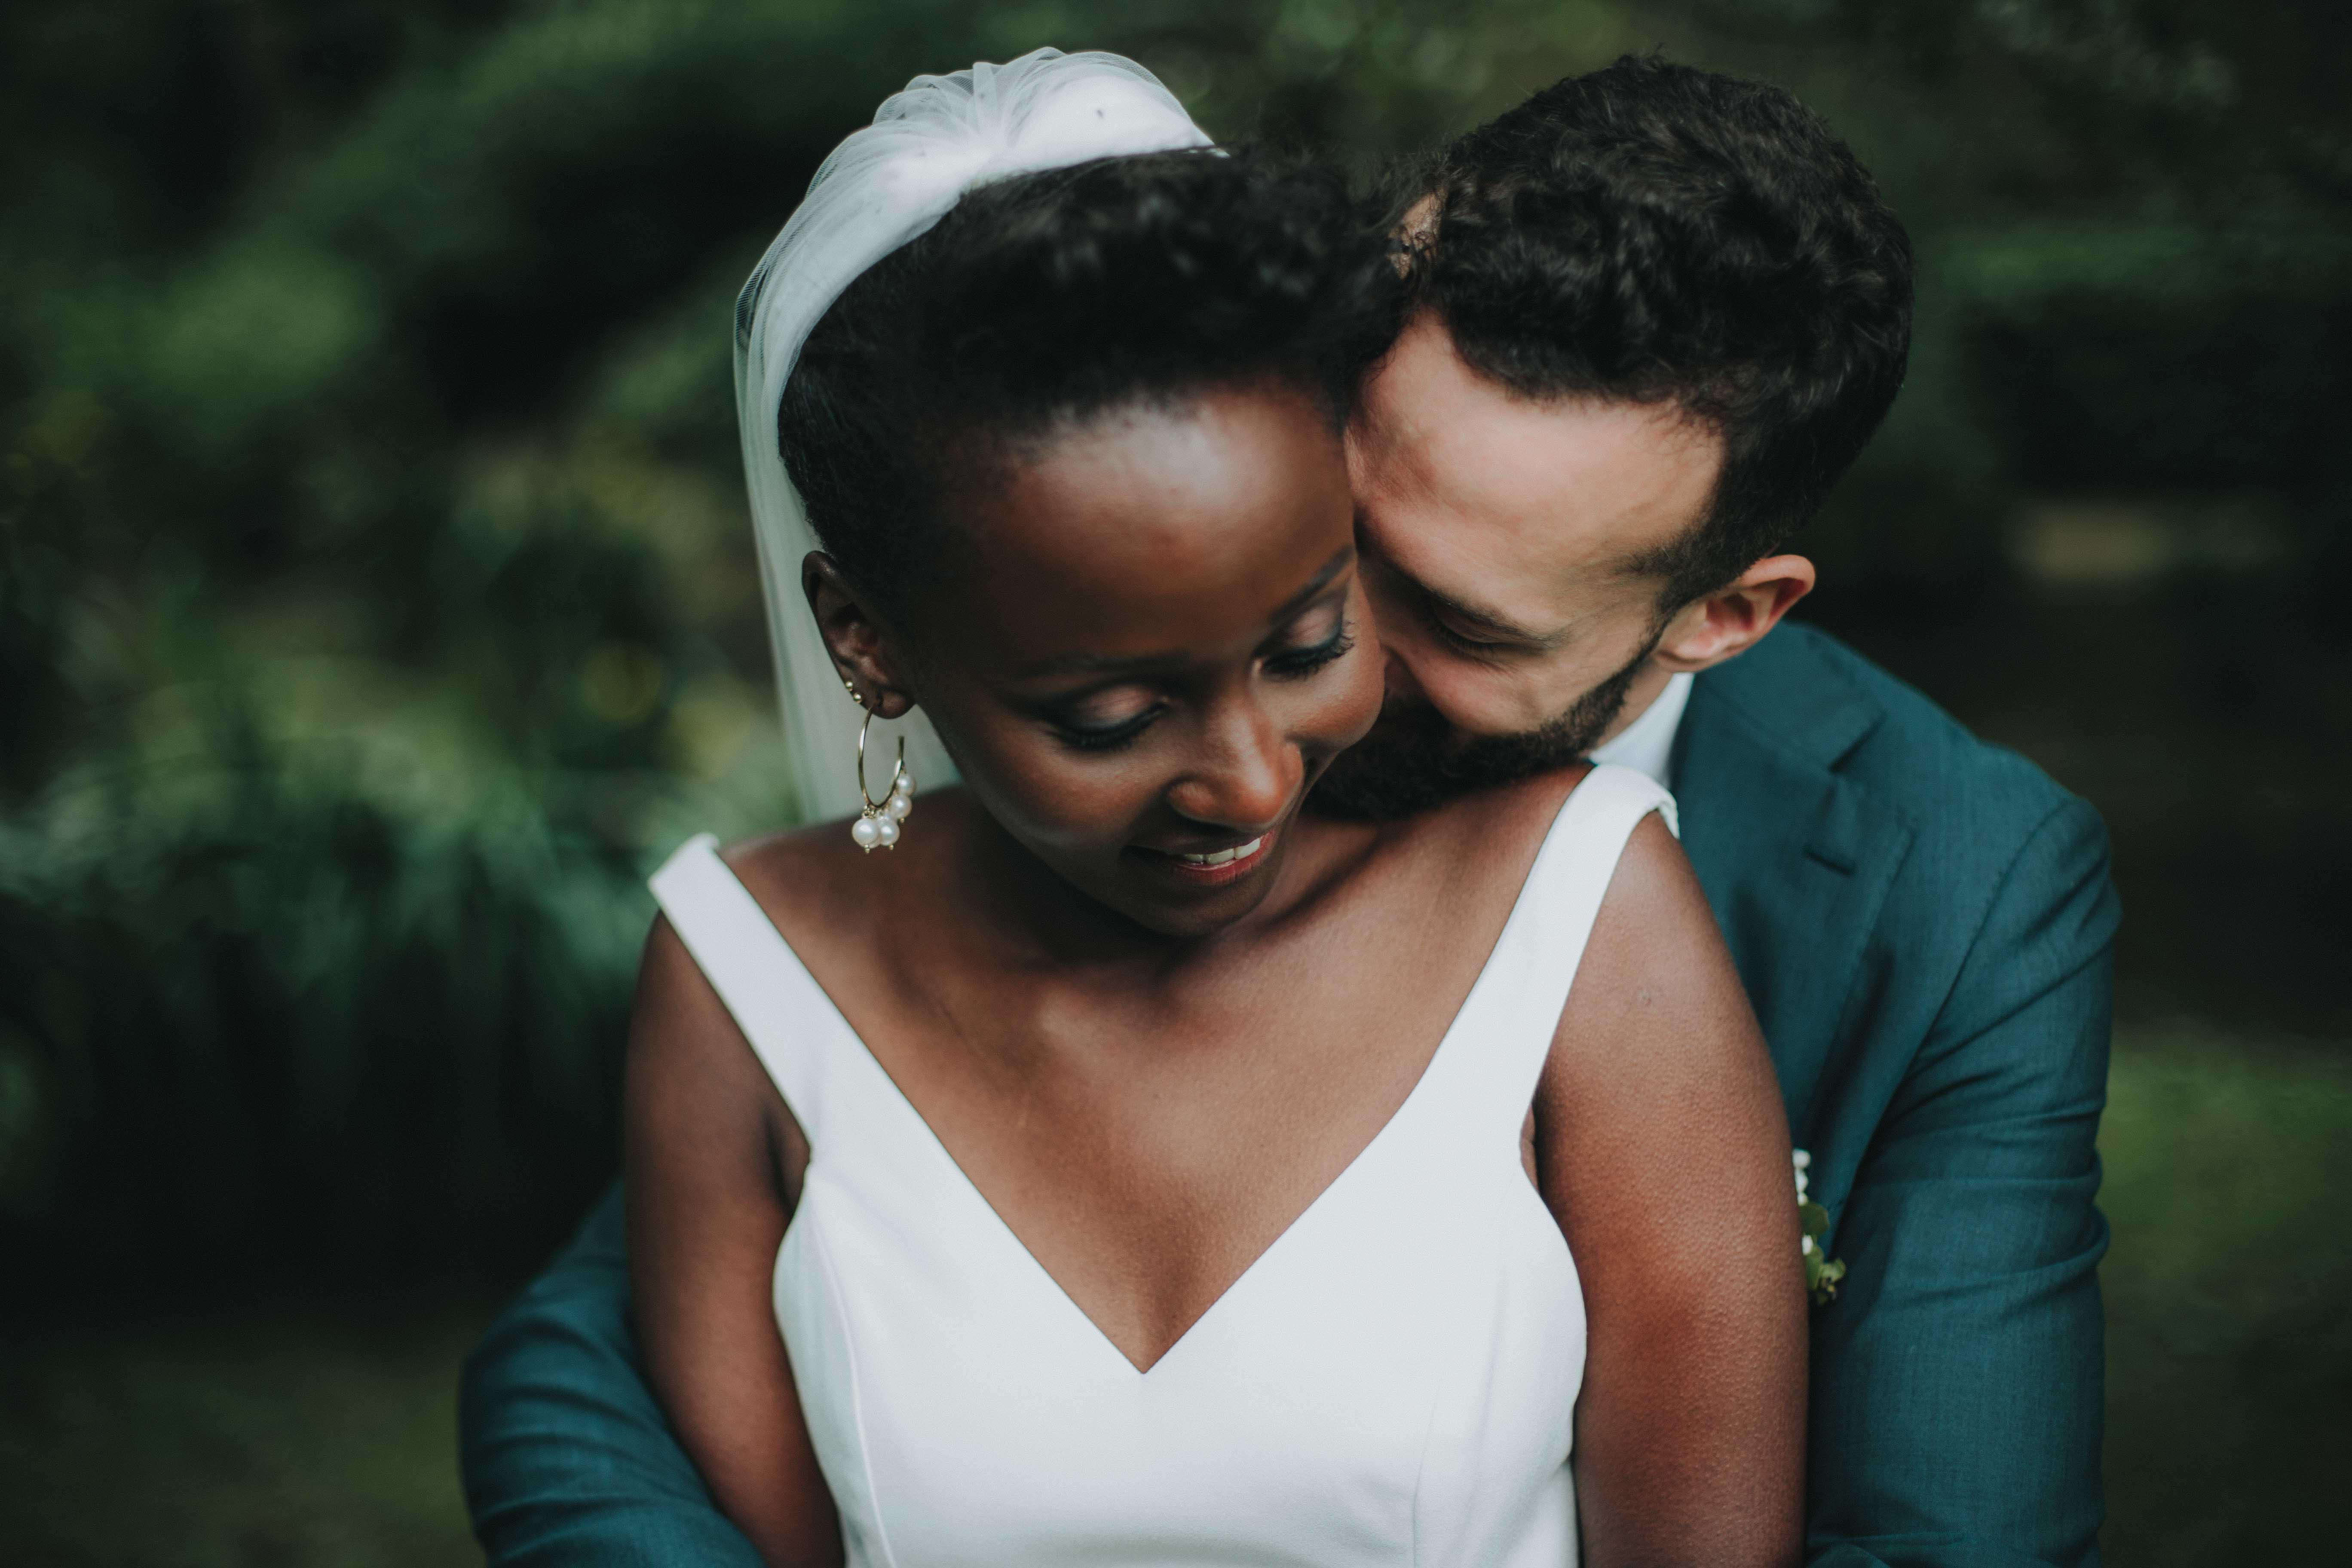 DOMAINE_DE_BÉRONSART_FANNY_MYARD_MARIAGE